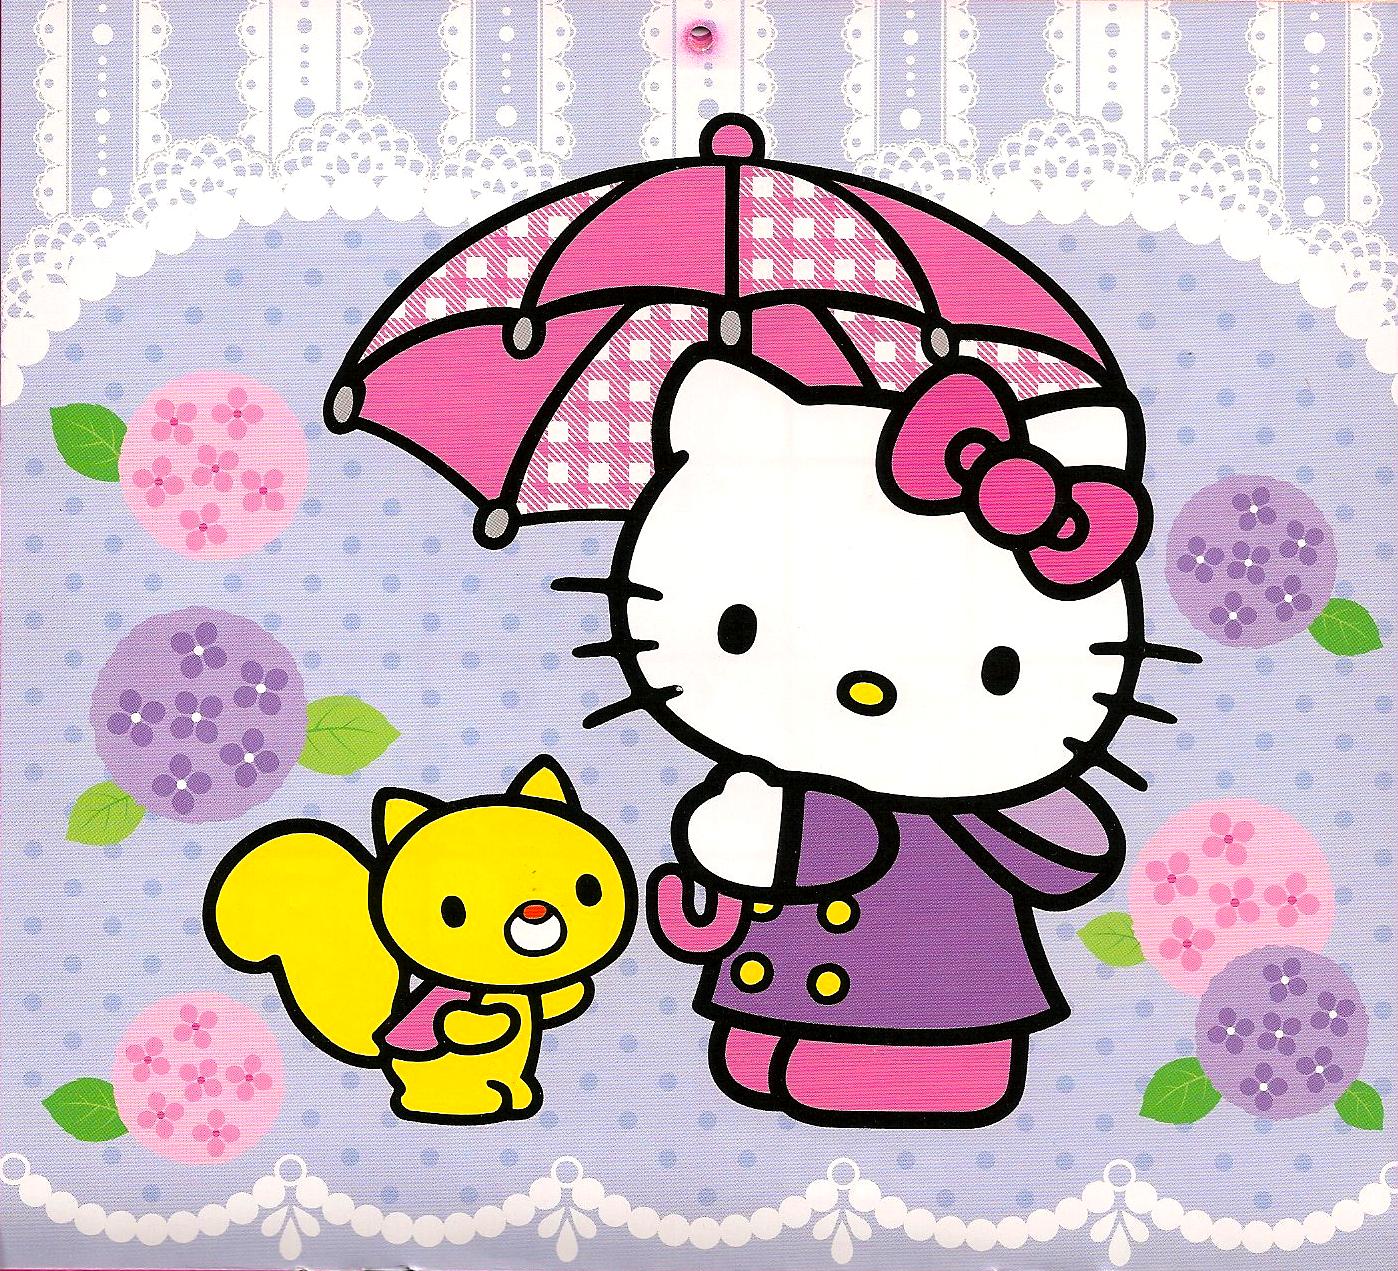 Top Wallpaper Hello Kitty Diamond - 43283b4315e453b94752703e840eca17  Graphic_96564.png